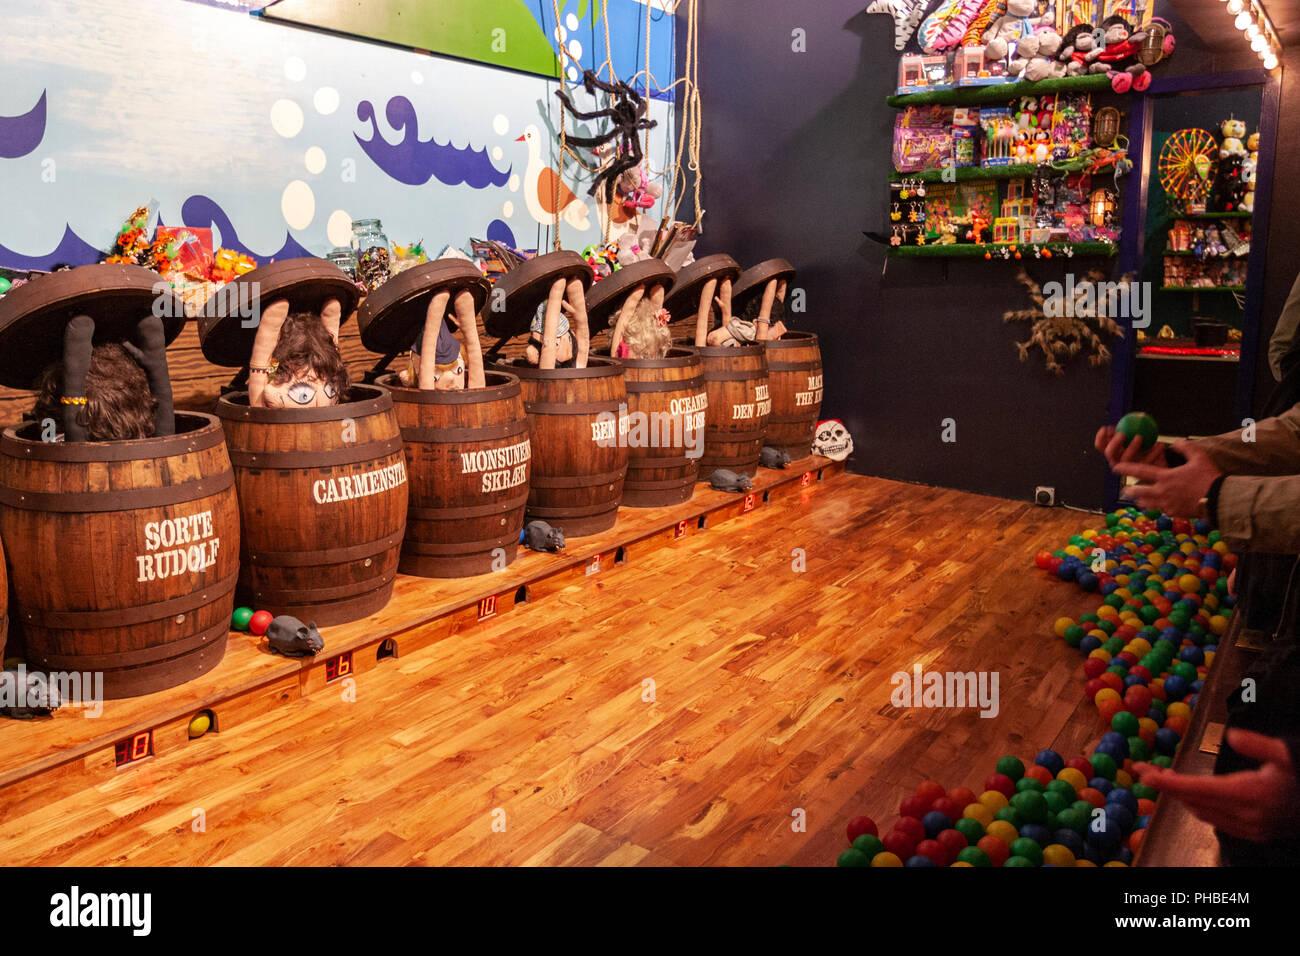 Ball gale throwing to barrels during Halloween in Tivoli Gardens amusement park and pleasure garden, Copenhagen, Denmark - Stock Image